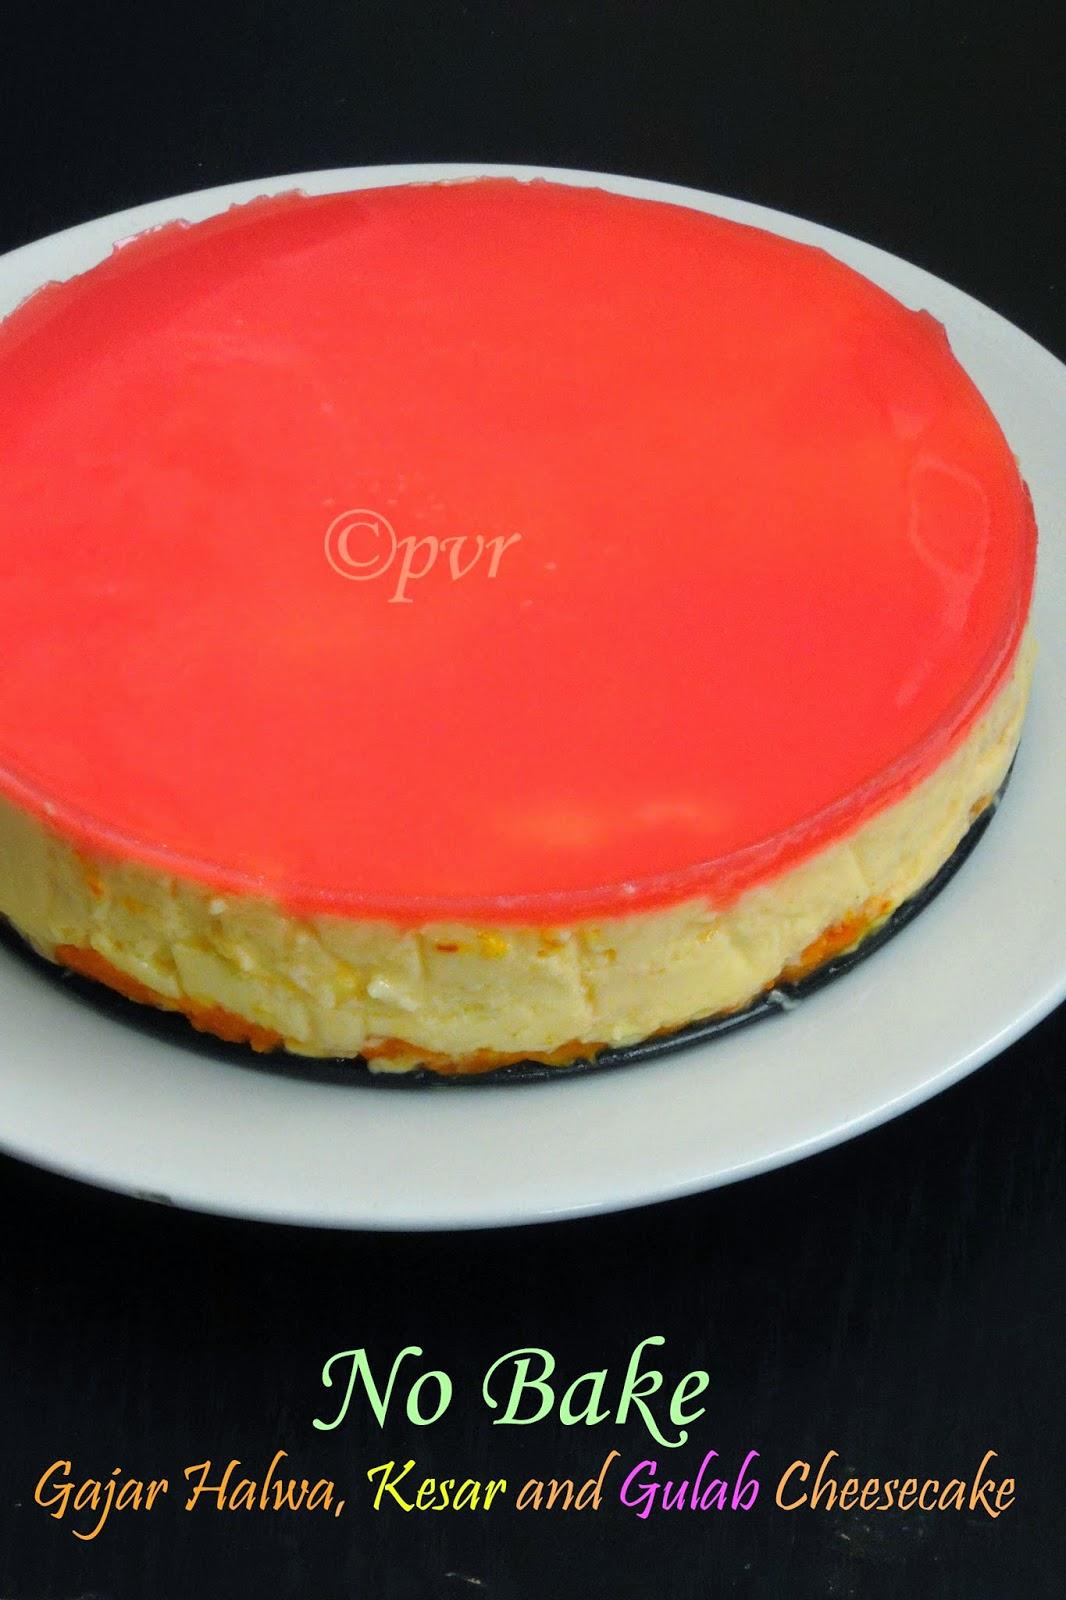 No Bake Gajar Halwa, Kesar and Gulab Cheesecake